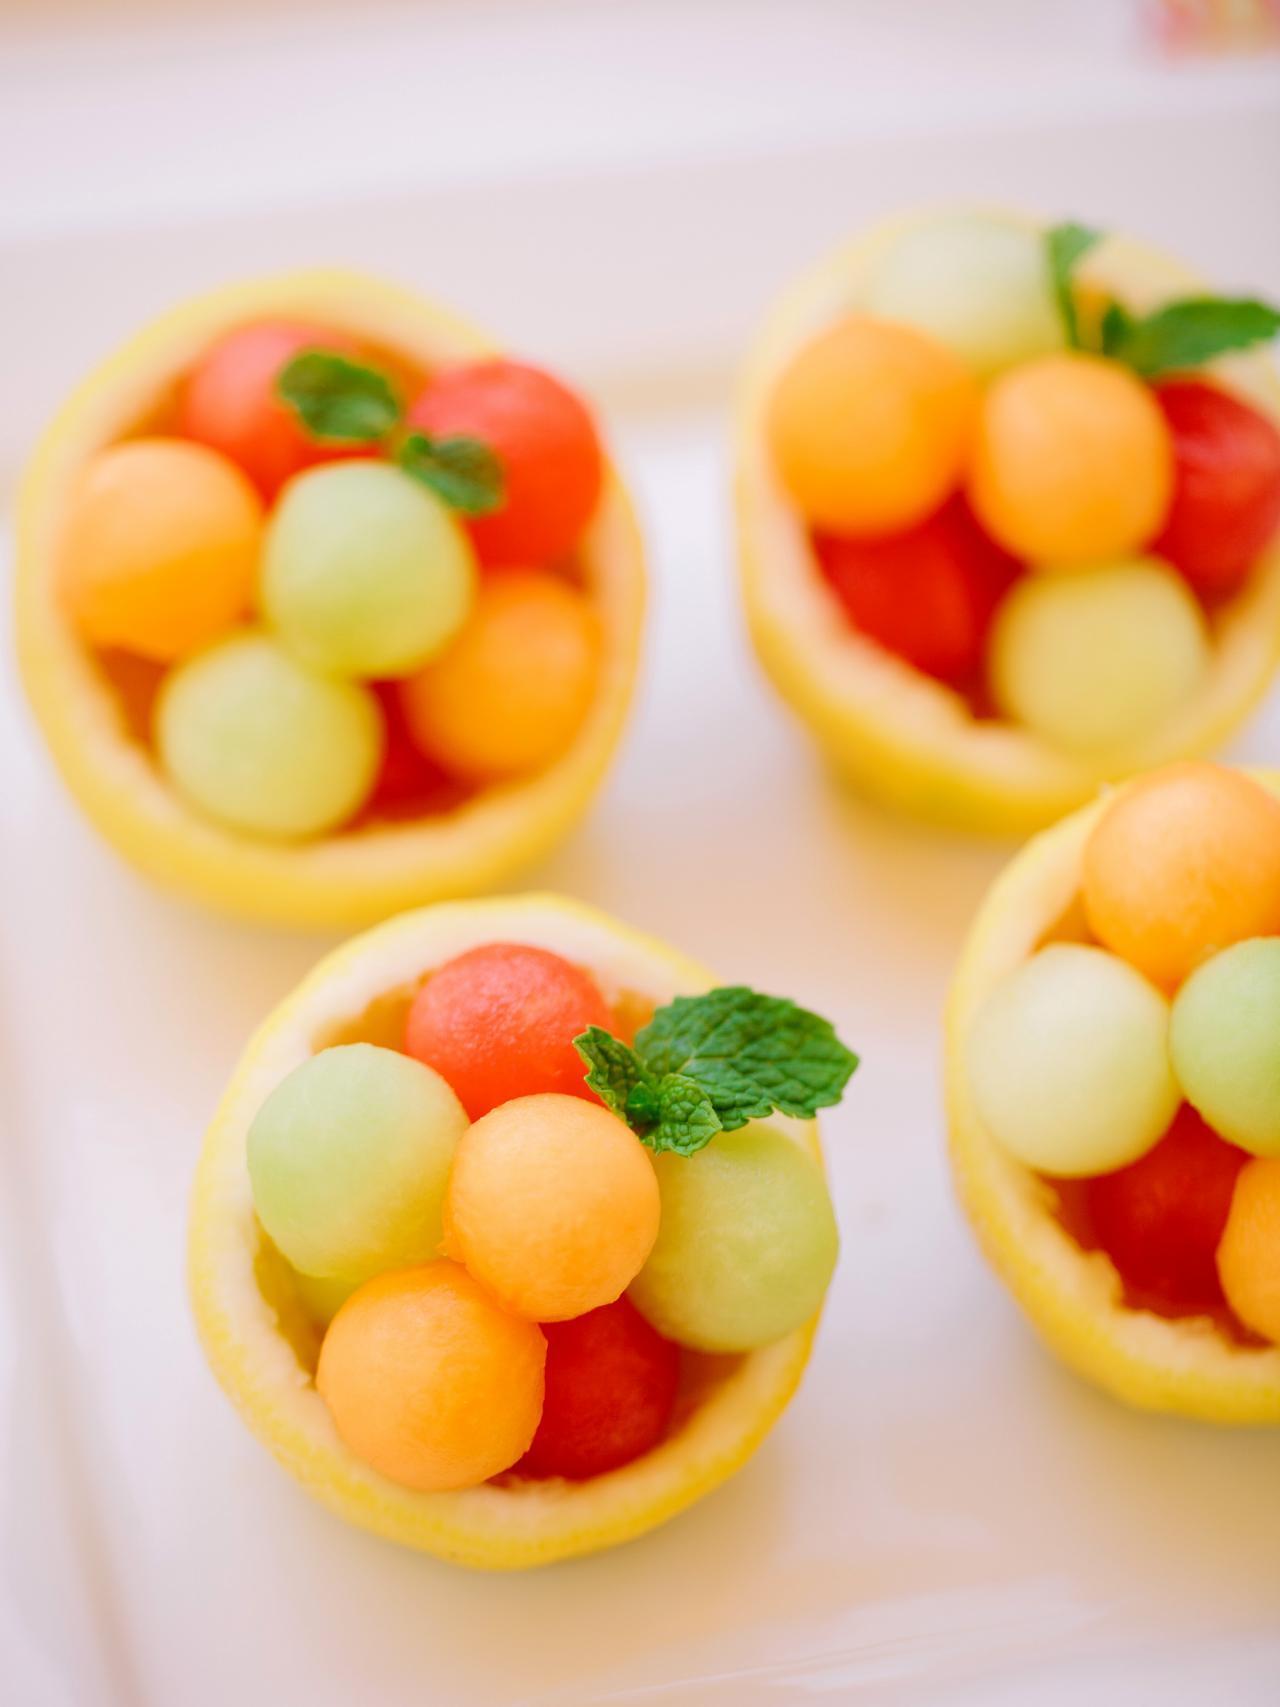 How To Make Melon Filled Citrus Bowls Diy